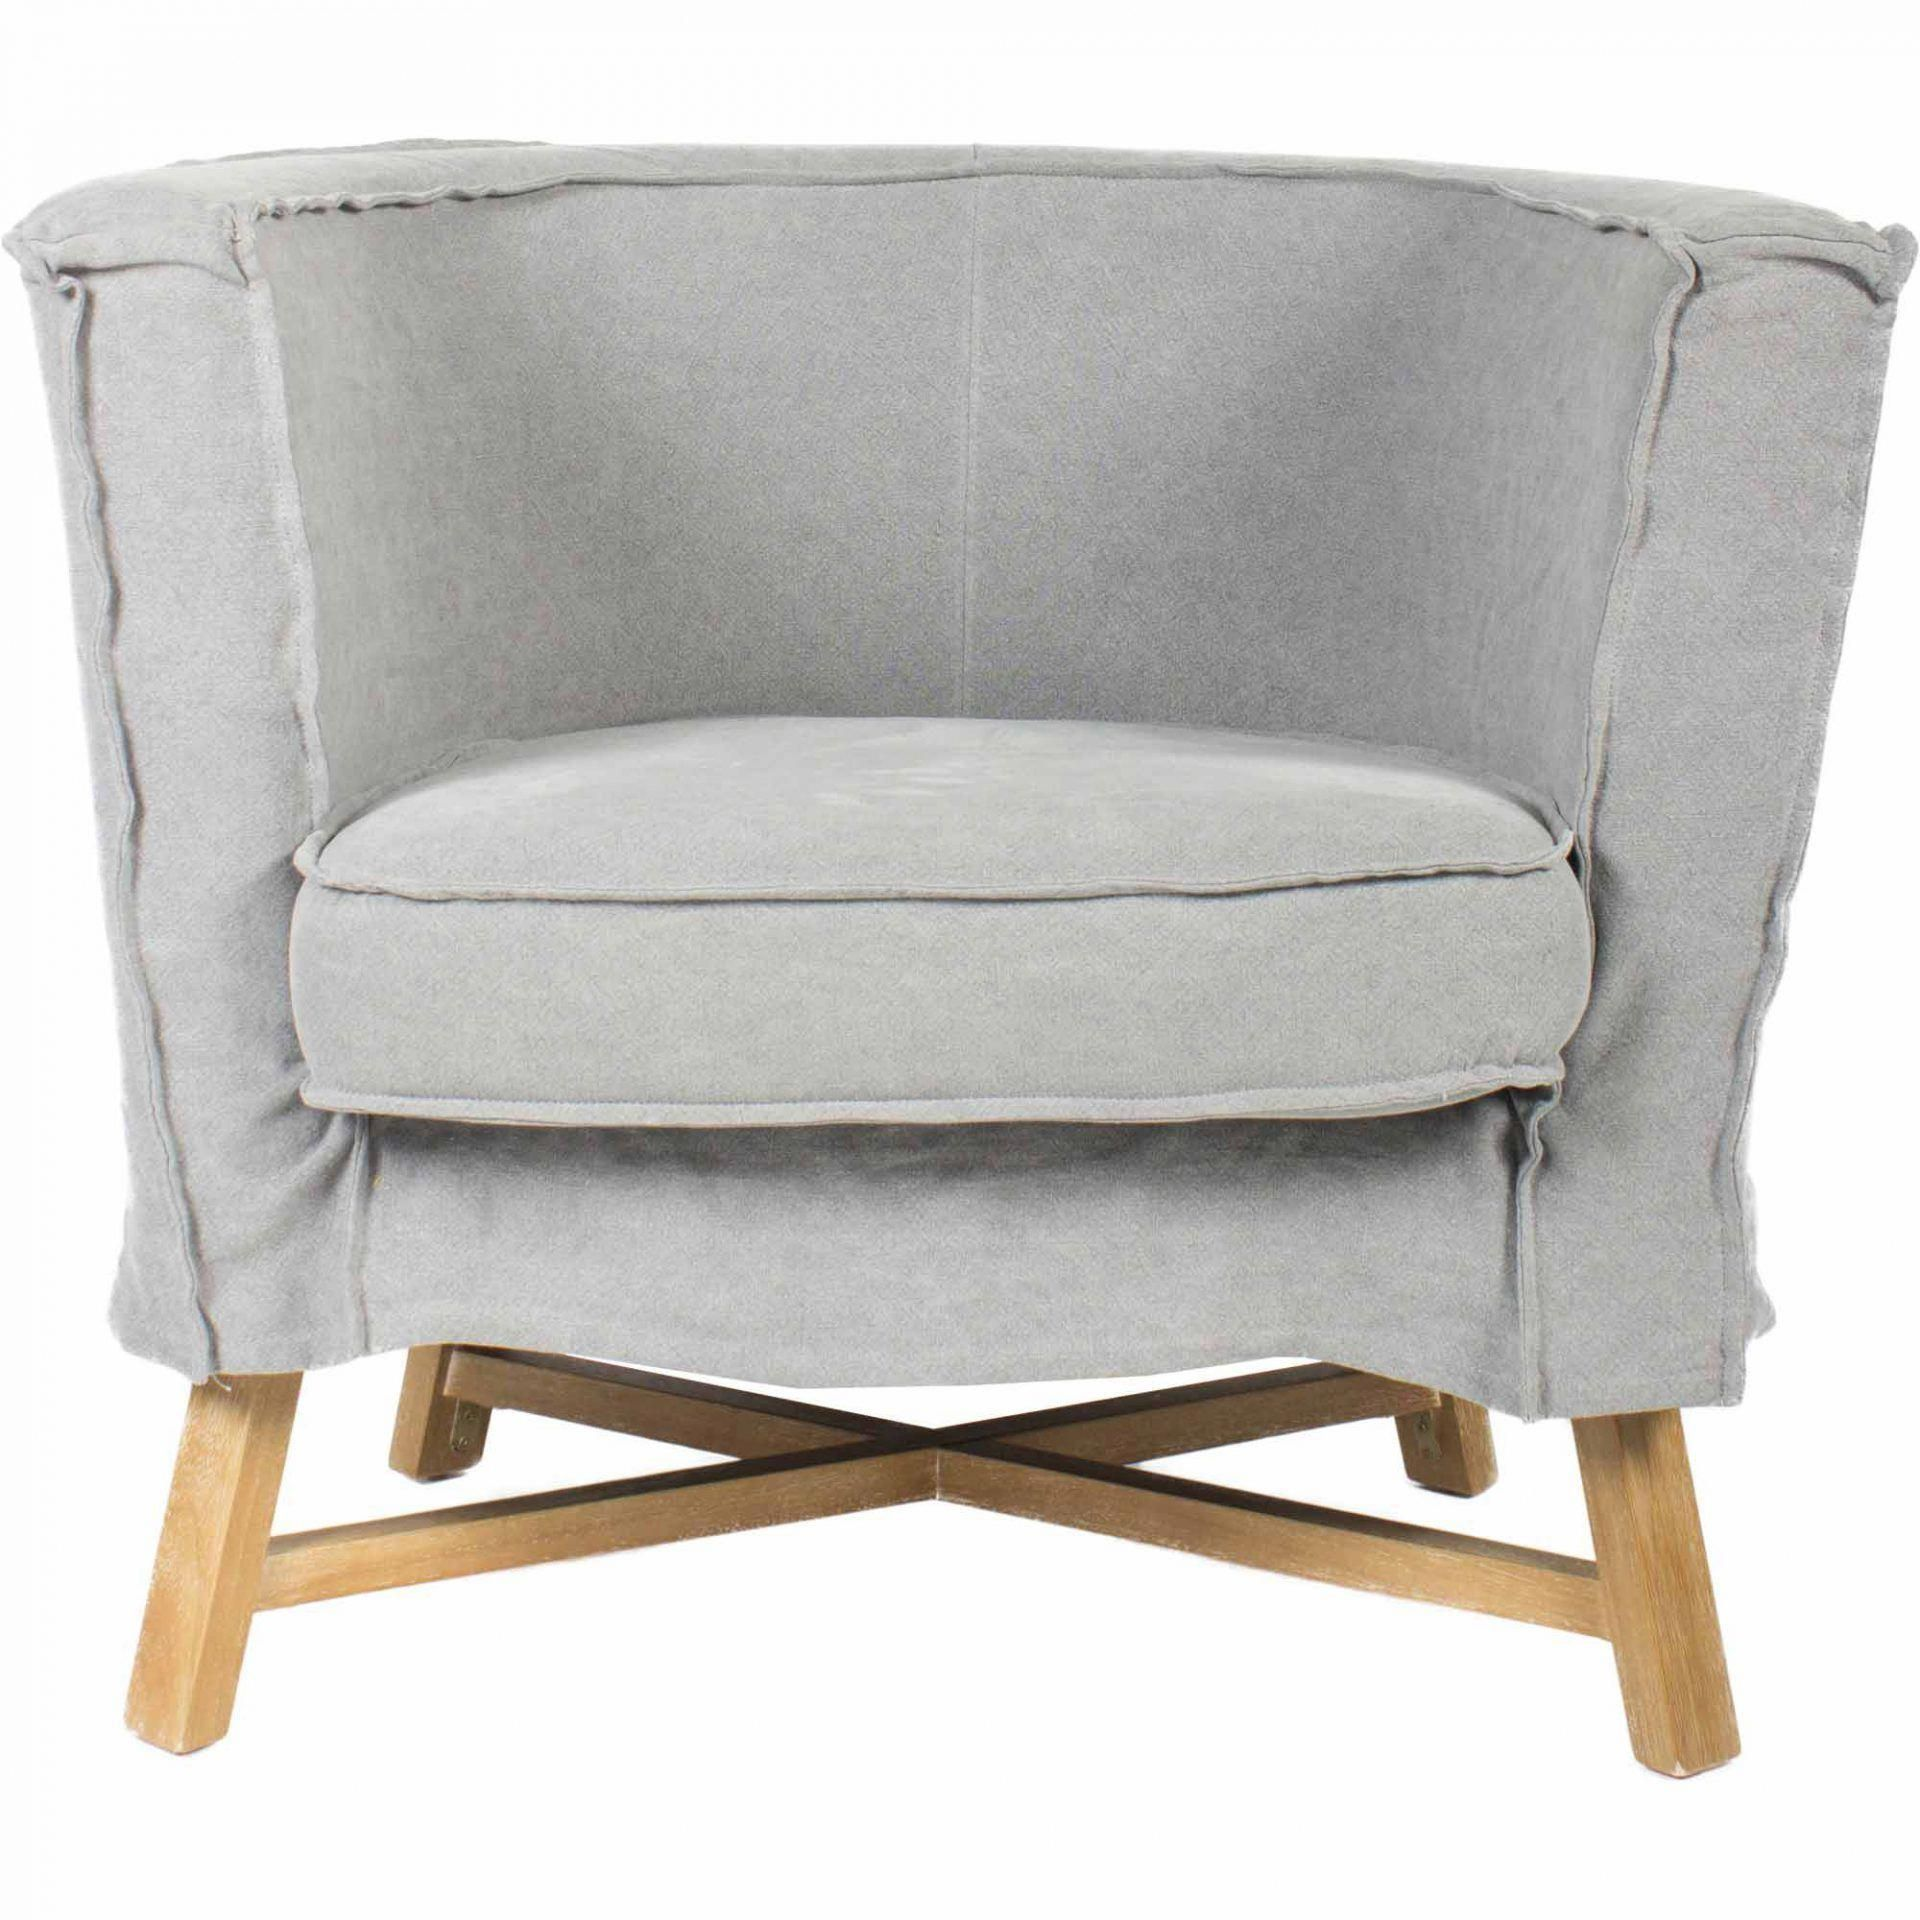 Light Grey Chair Diy Accent Plans Grand Club Chairs Moe S Wholesale Rockingchair